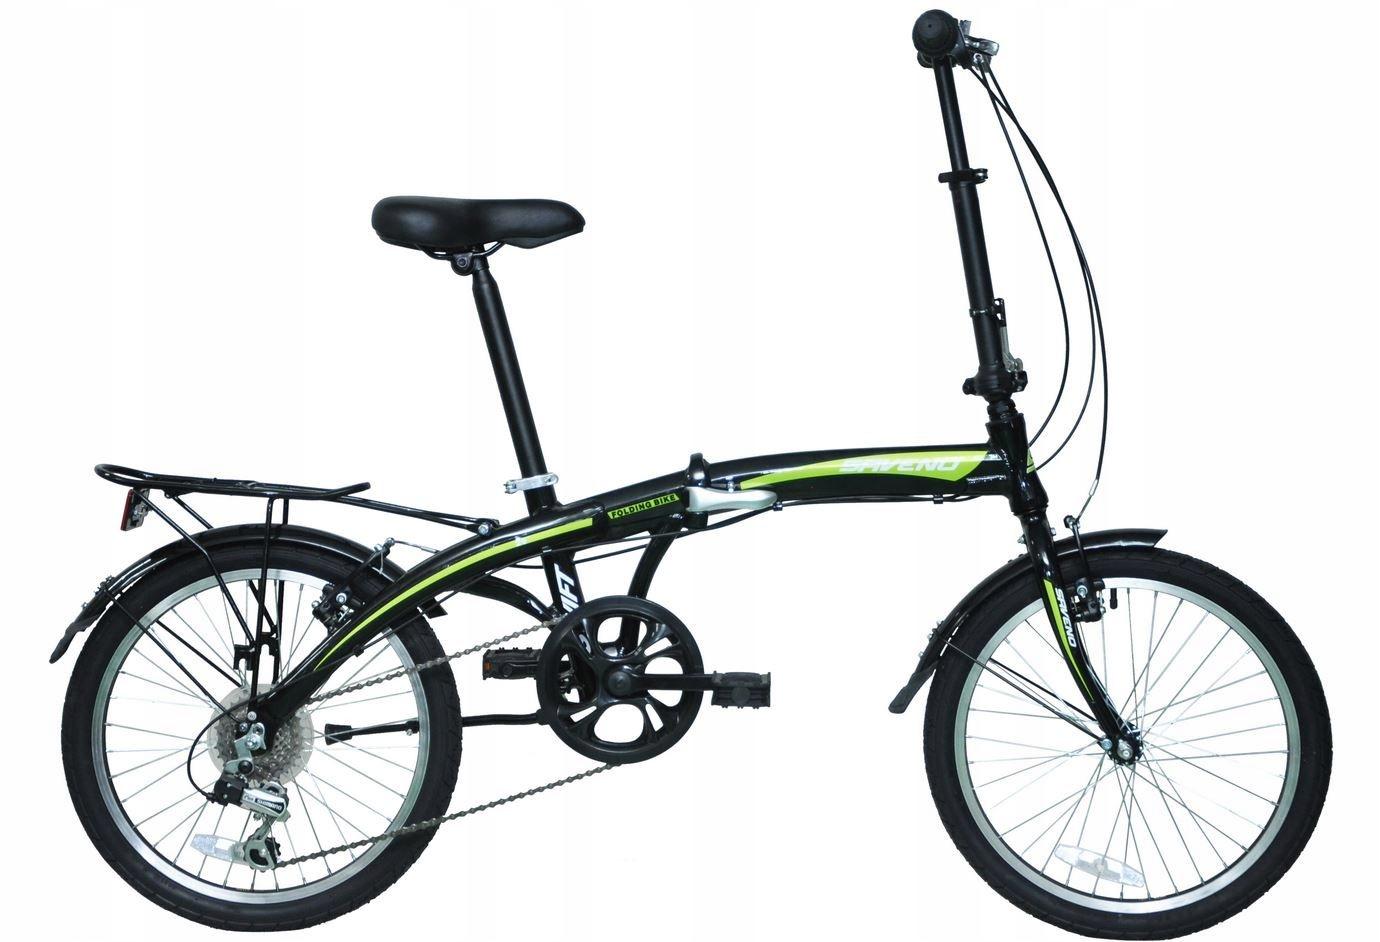 "Rower SAVENO Swift 20"" black/green składak 20"